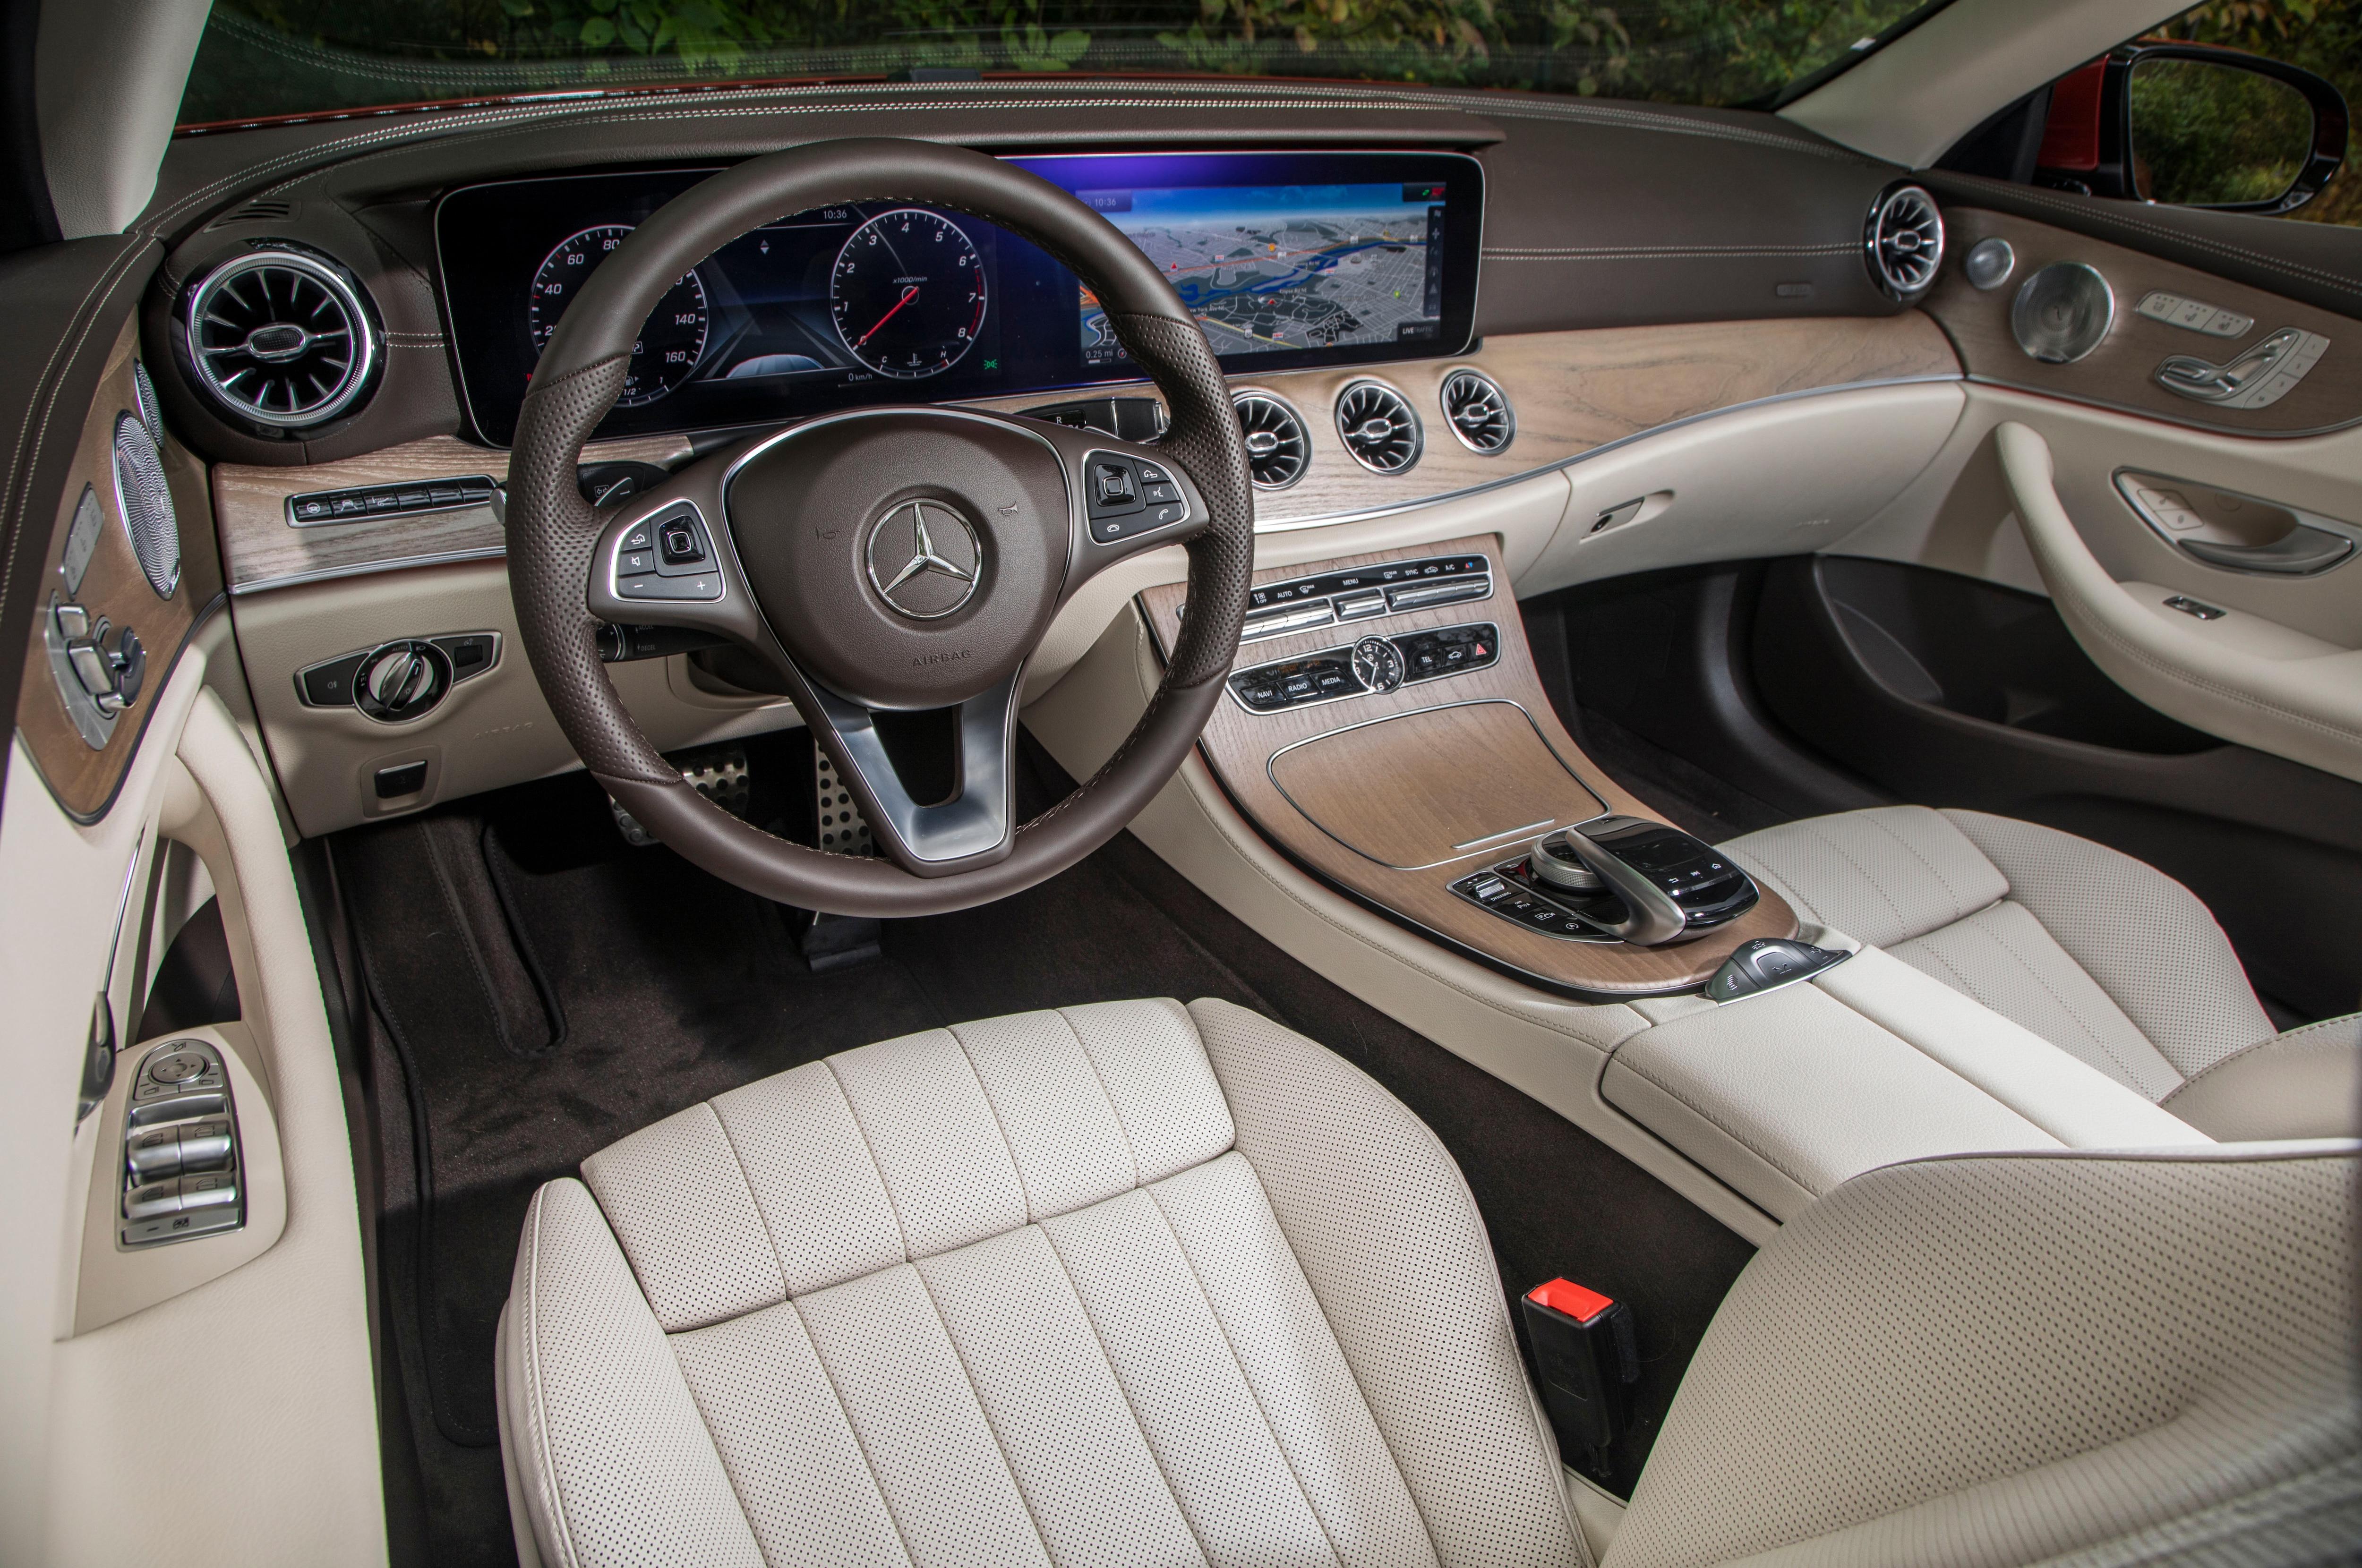 2018 E400 Convertible >> 2018 Mercedes-Benz E-Class Cabriolet Starts at $67,295   Automobile Magazine